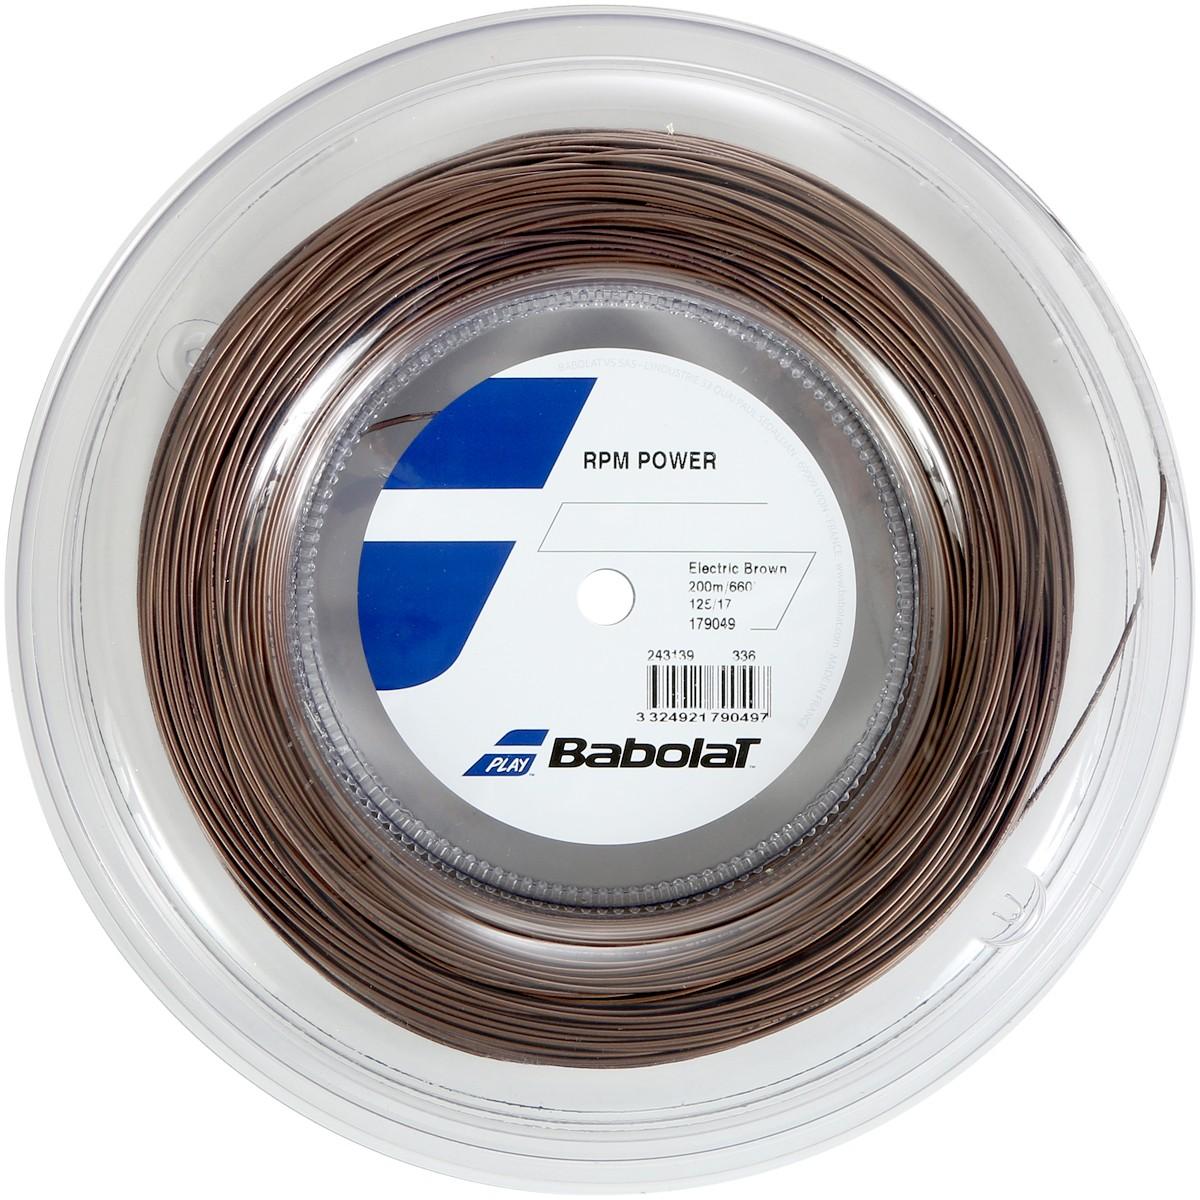 BOBINE BABOLAT RPM POWER (200 METRES)